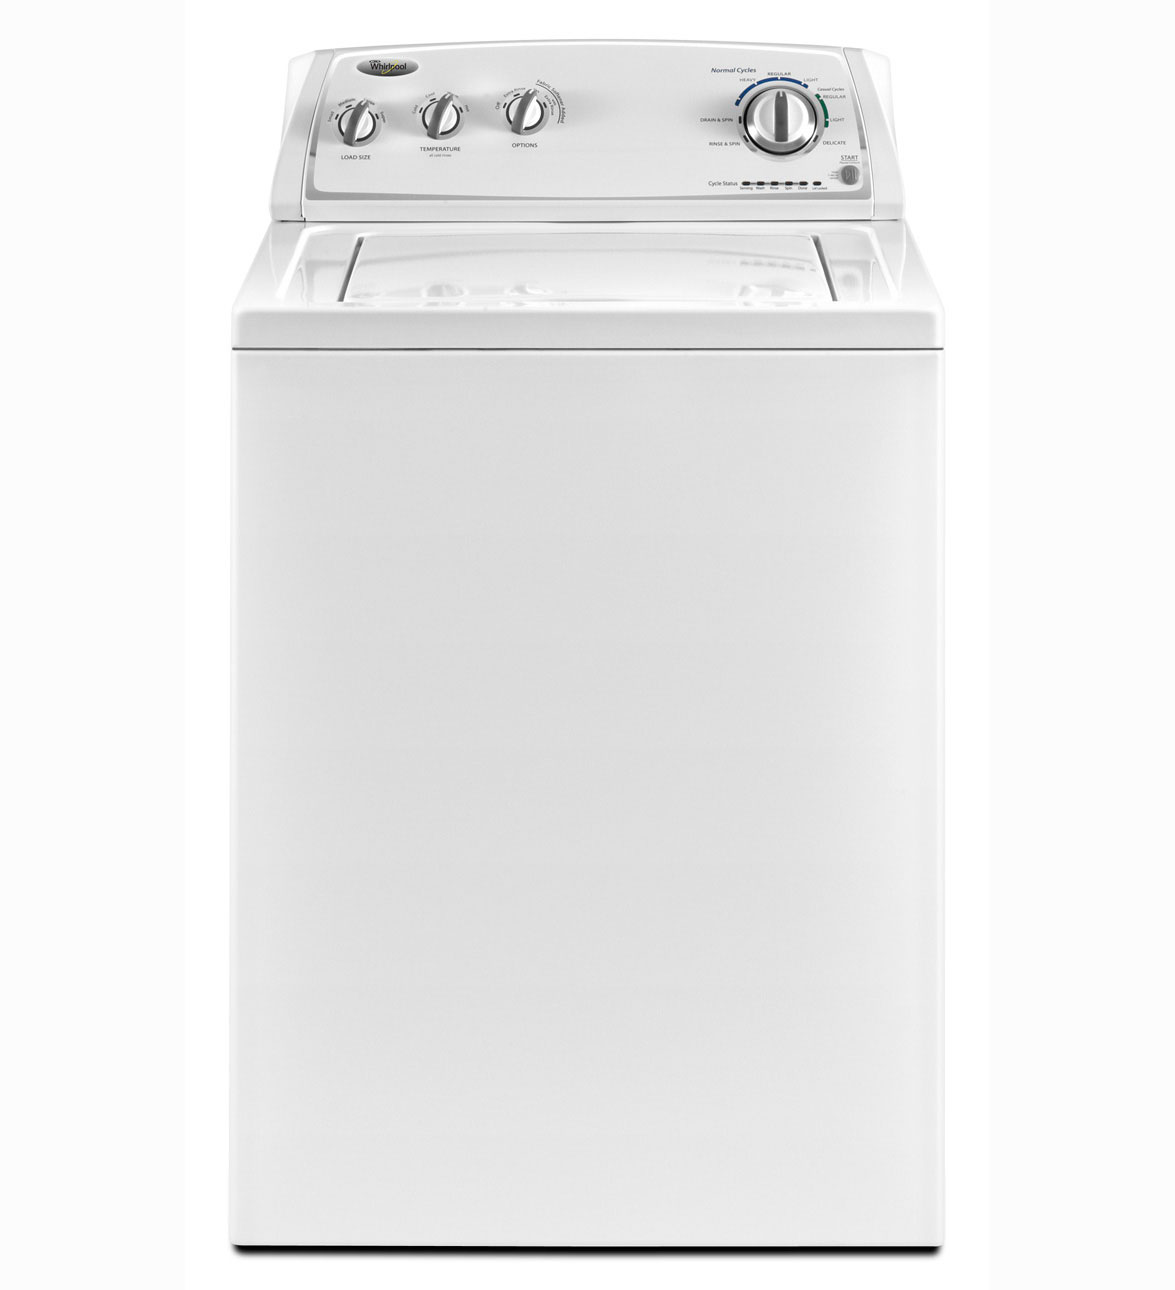 Whirlpool 3.4 cu ft Top-Load Washer (White) (Model: WTW4800XQ)